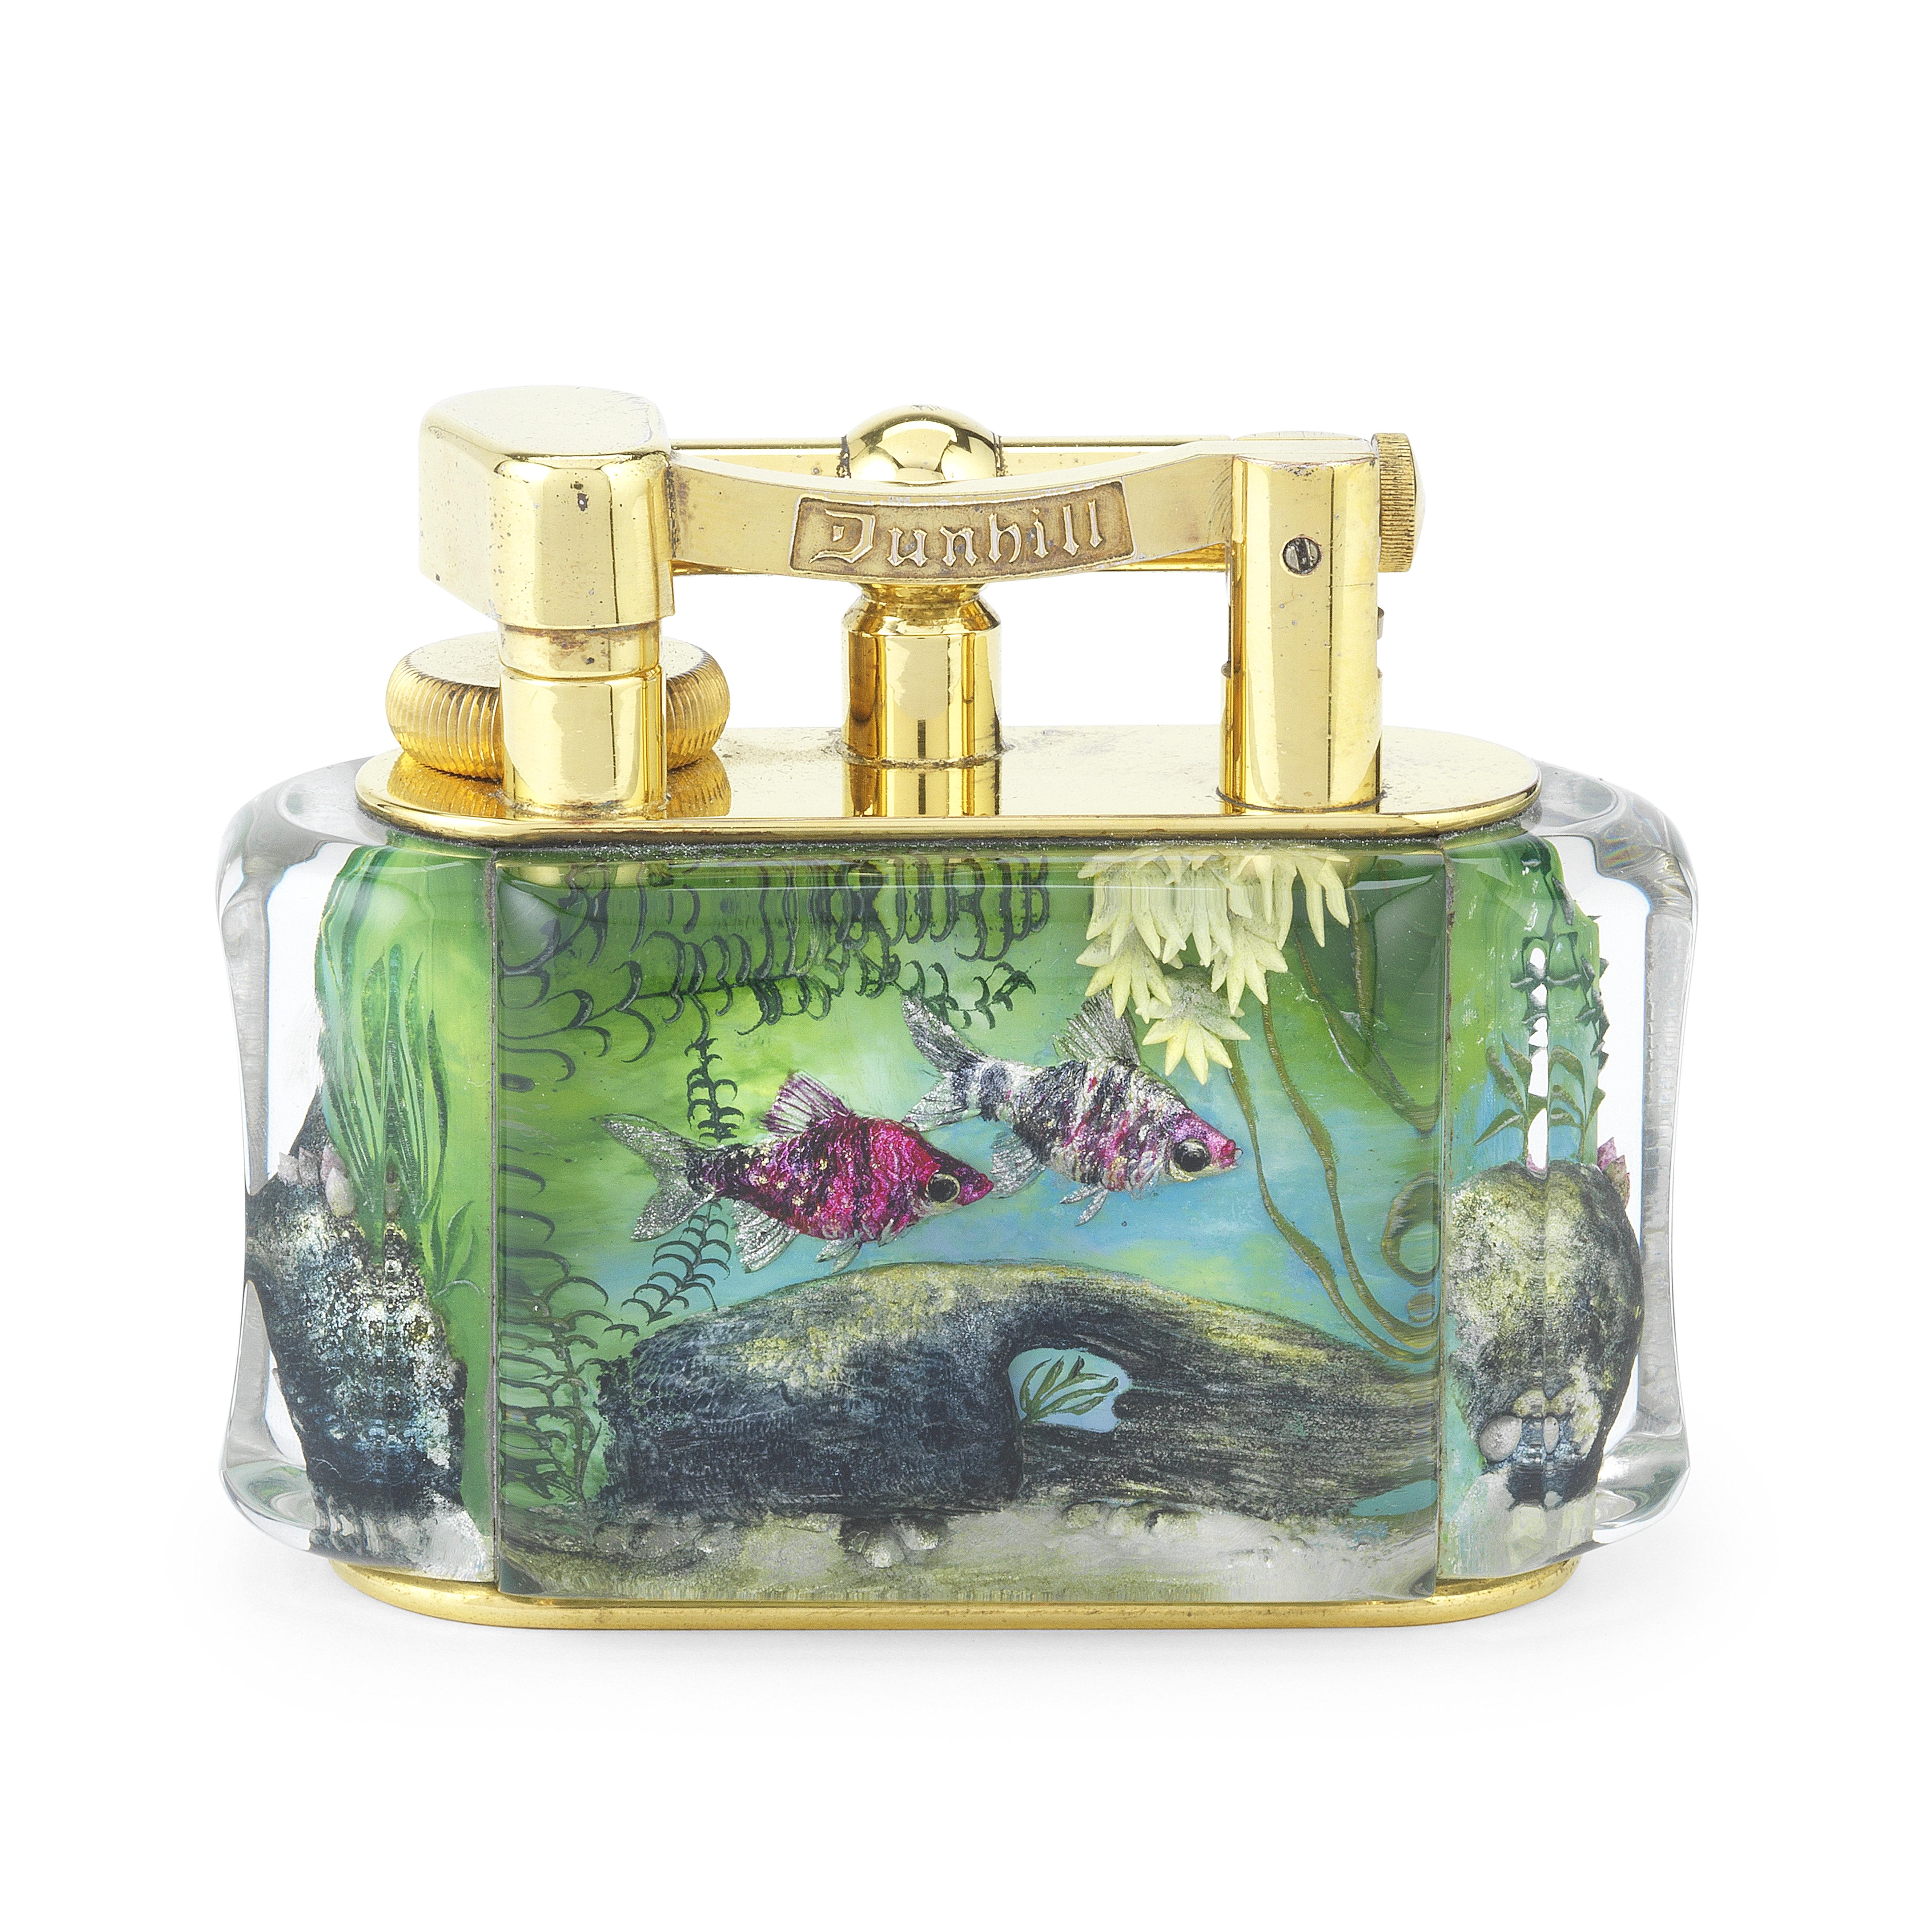 DUNHILL: a good gilt-plated and lucite 'Aquarium' lighter